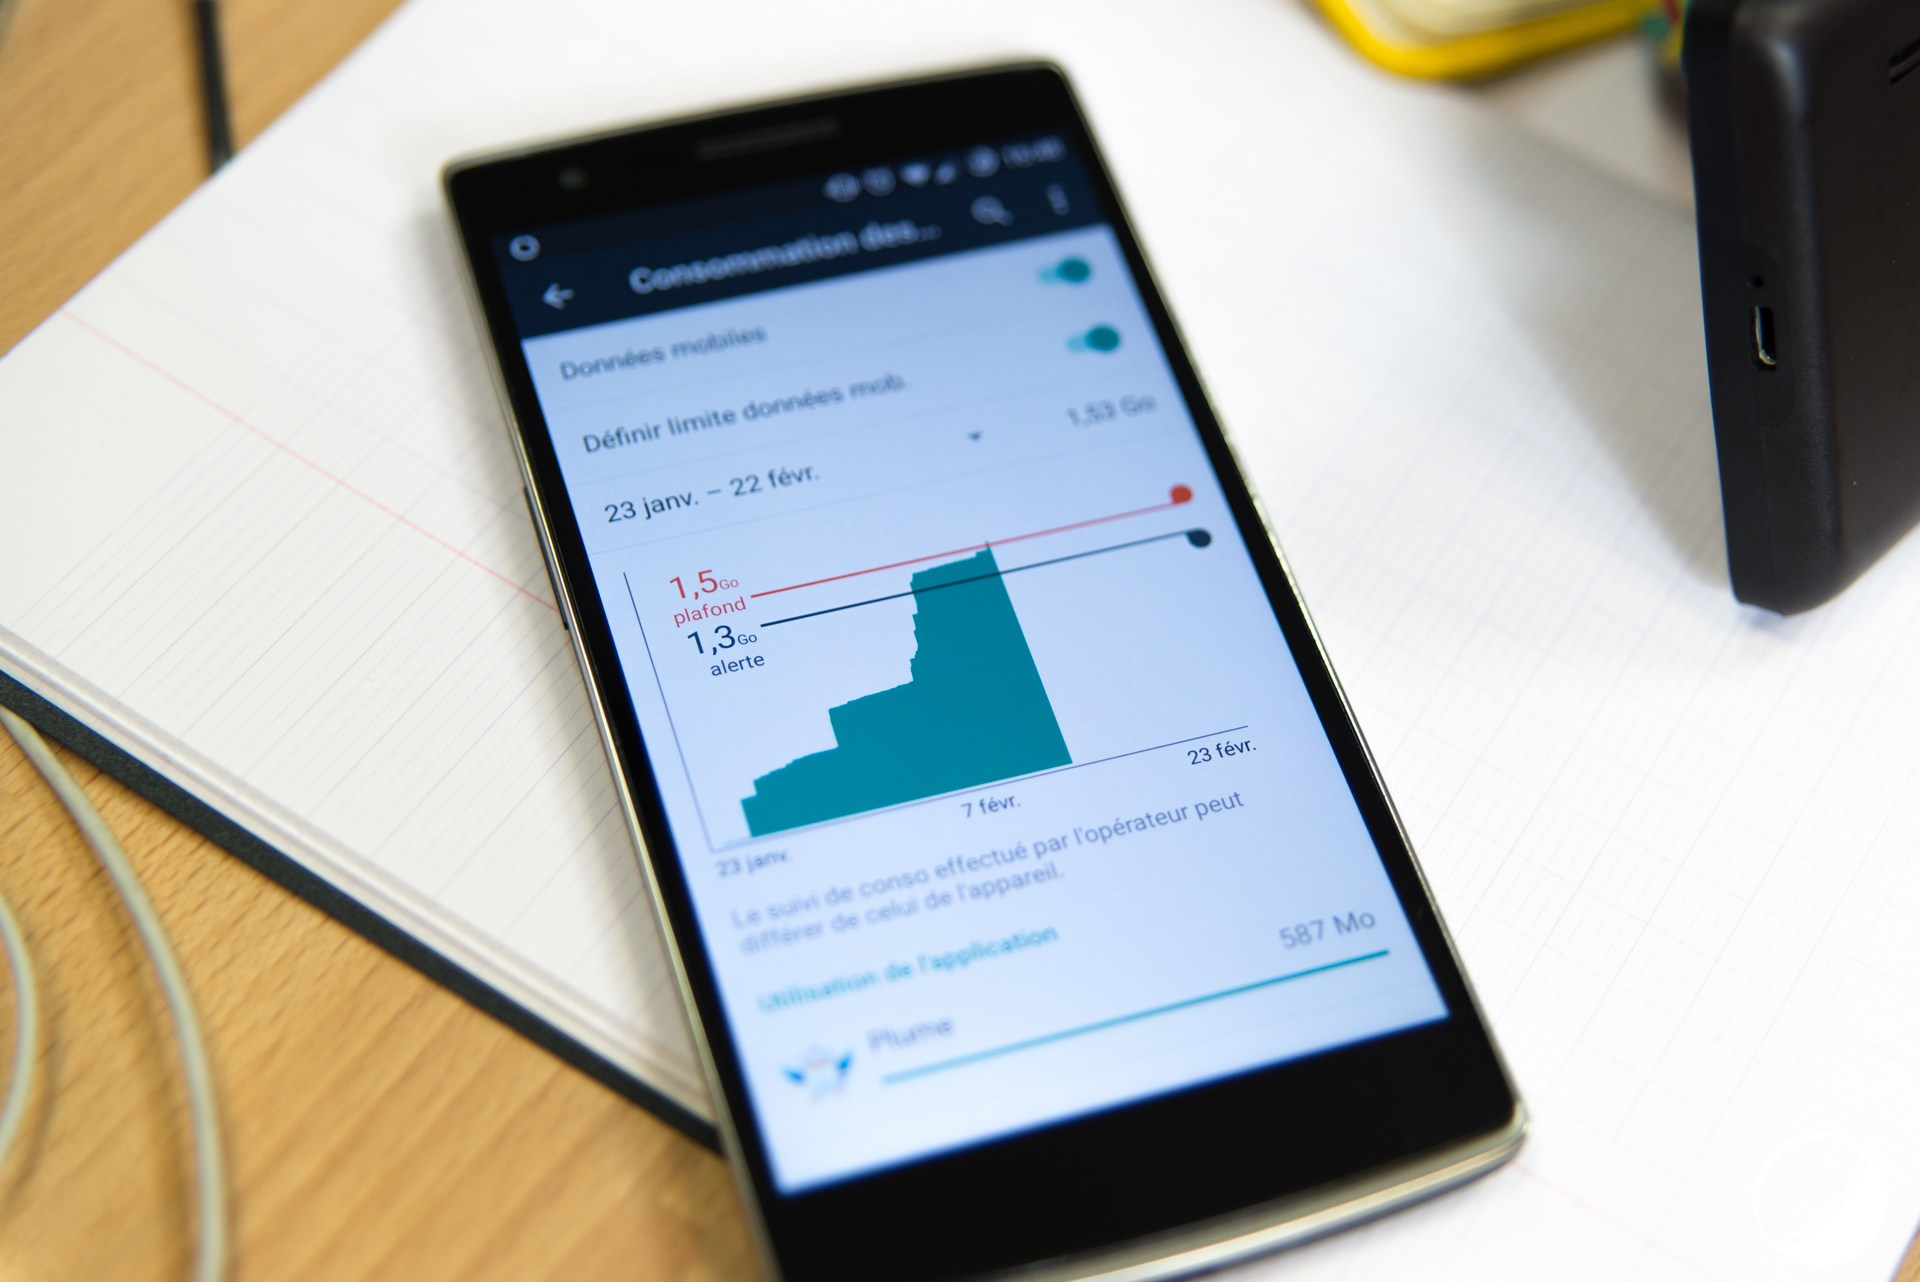 Tuto : Comment limiter sa consommation de data sur Android